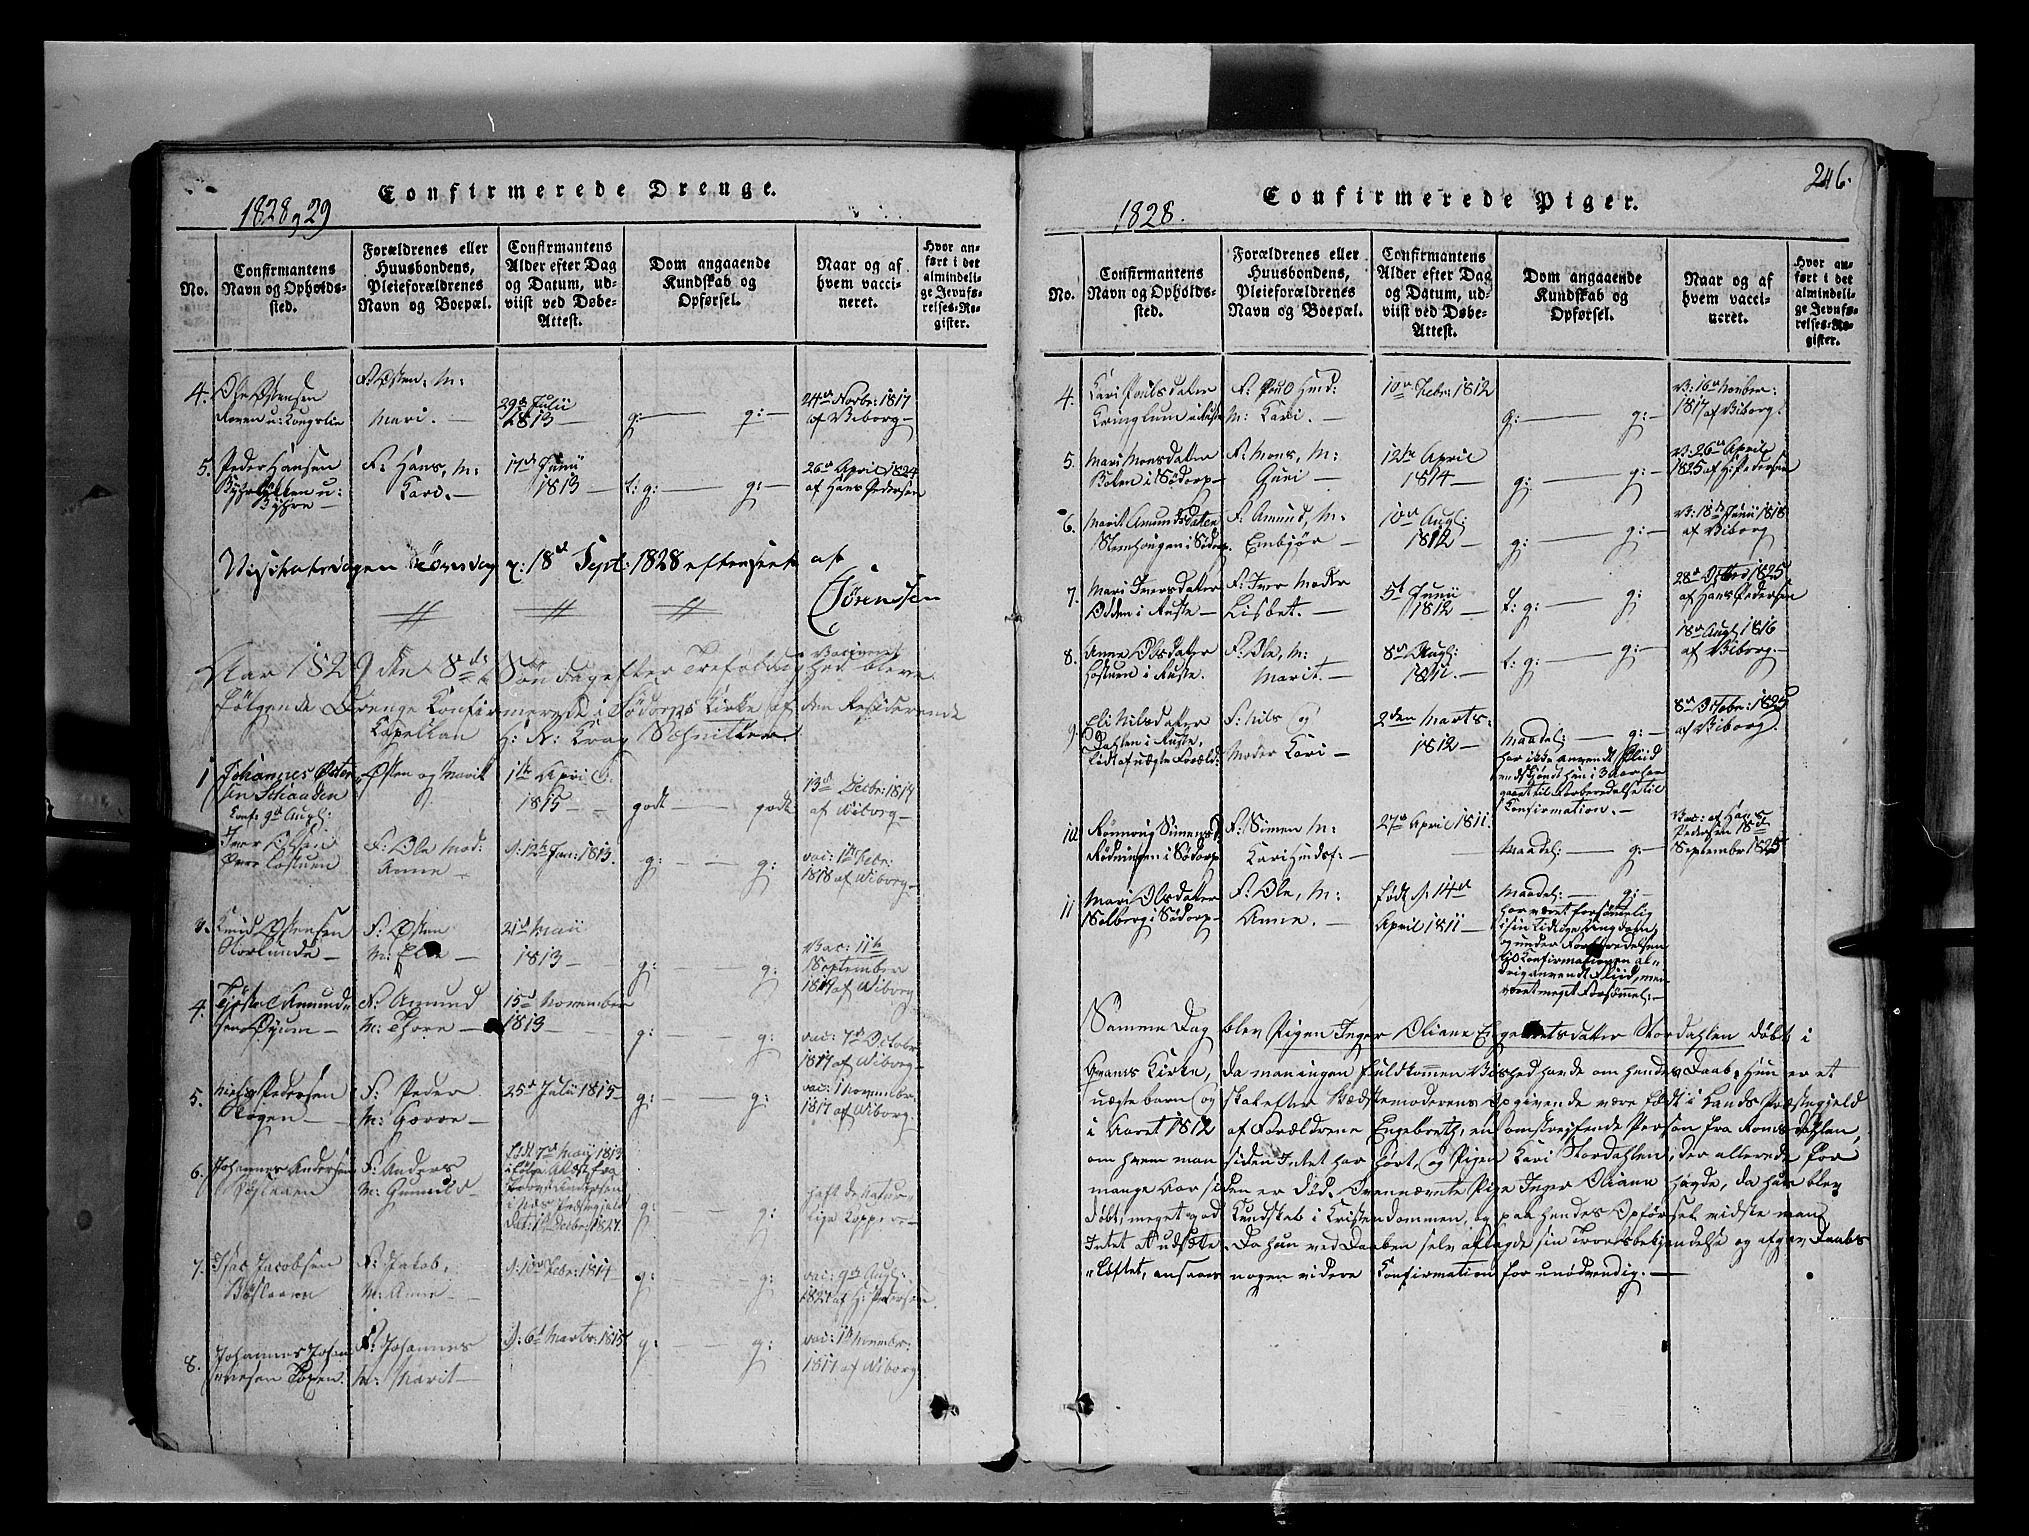 SAH, Fron prestekontor, H/Ha/Hab/L0004: Klokkerbok nr. 4, 1816-1850, s. 246